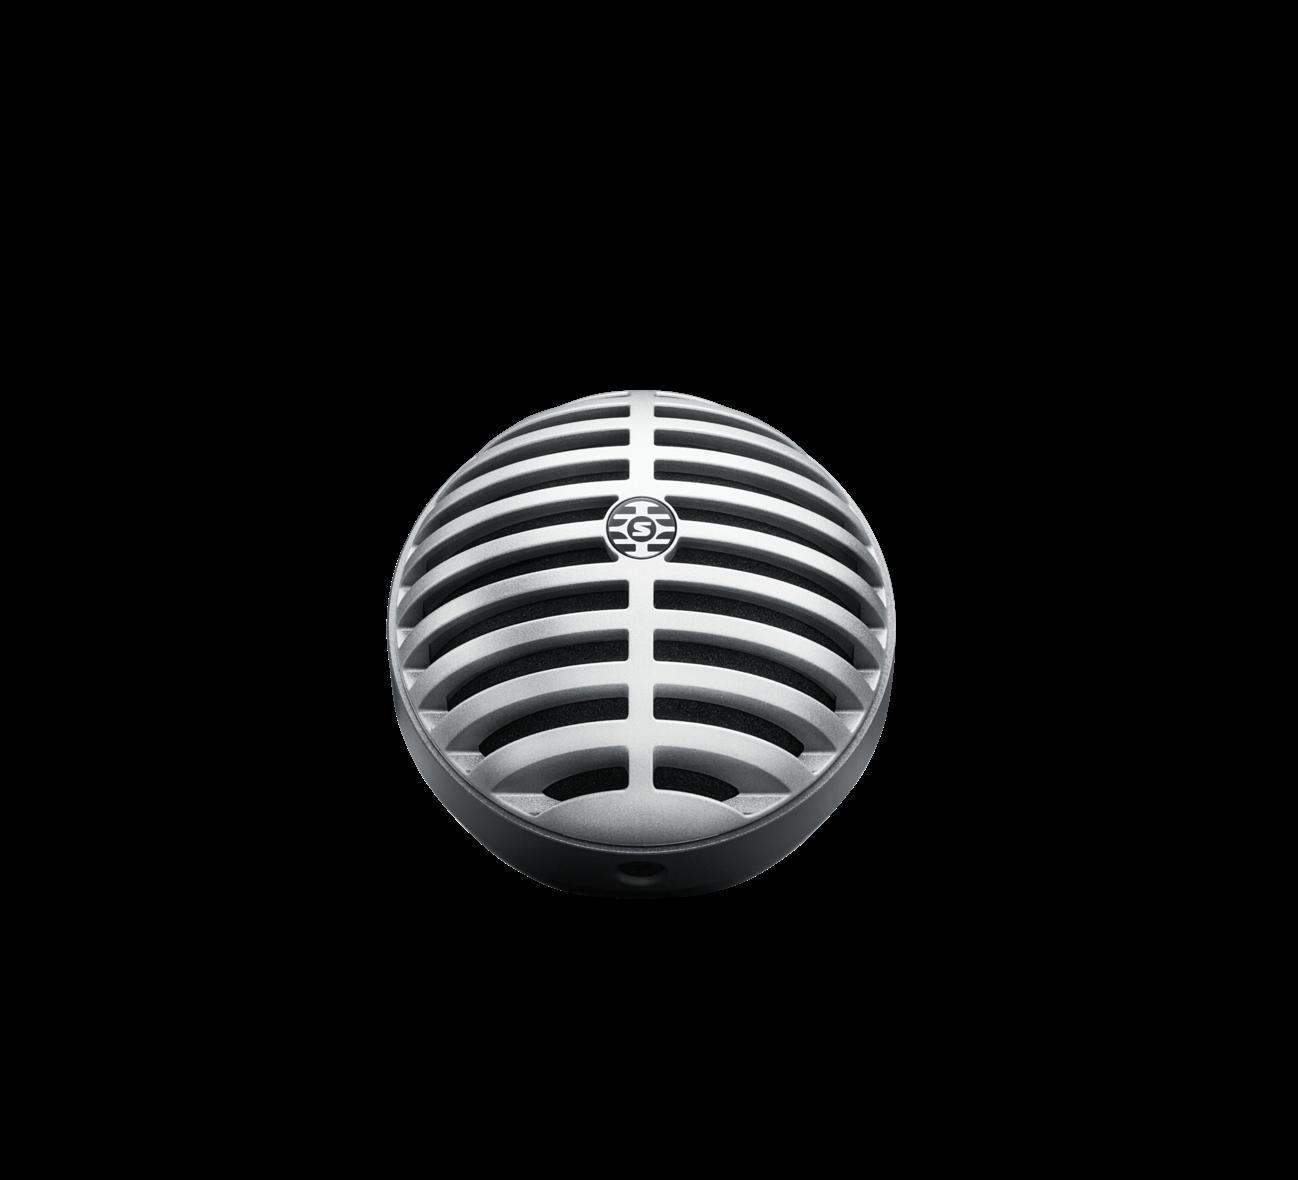 Micro phát trực tiếp livestream Shure MV5